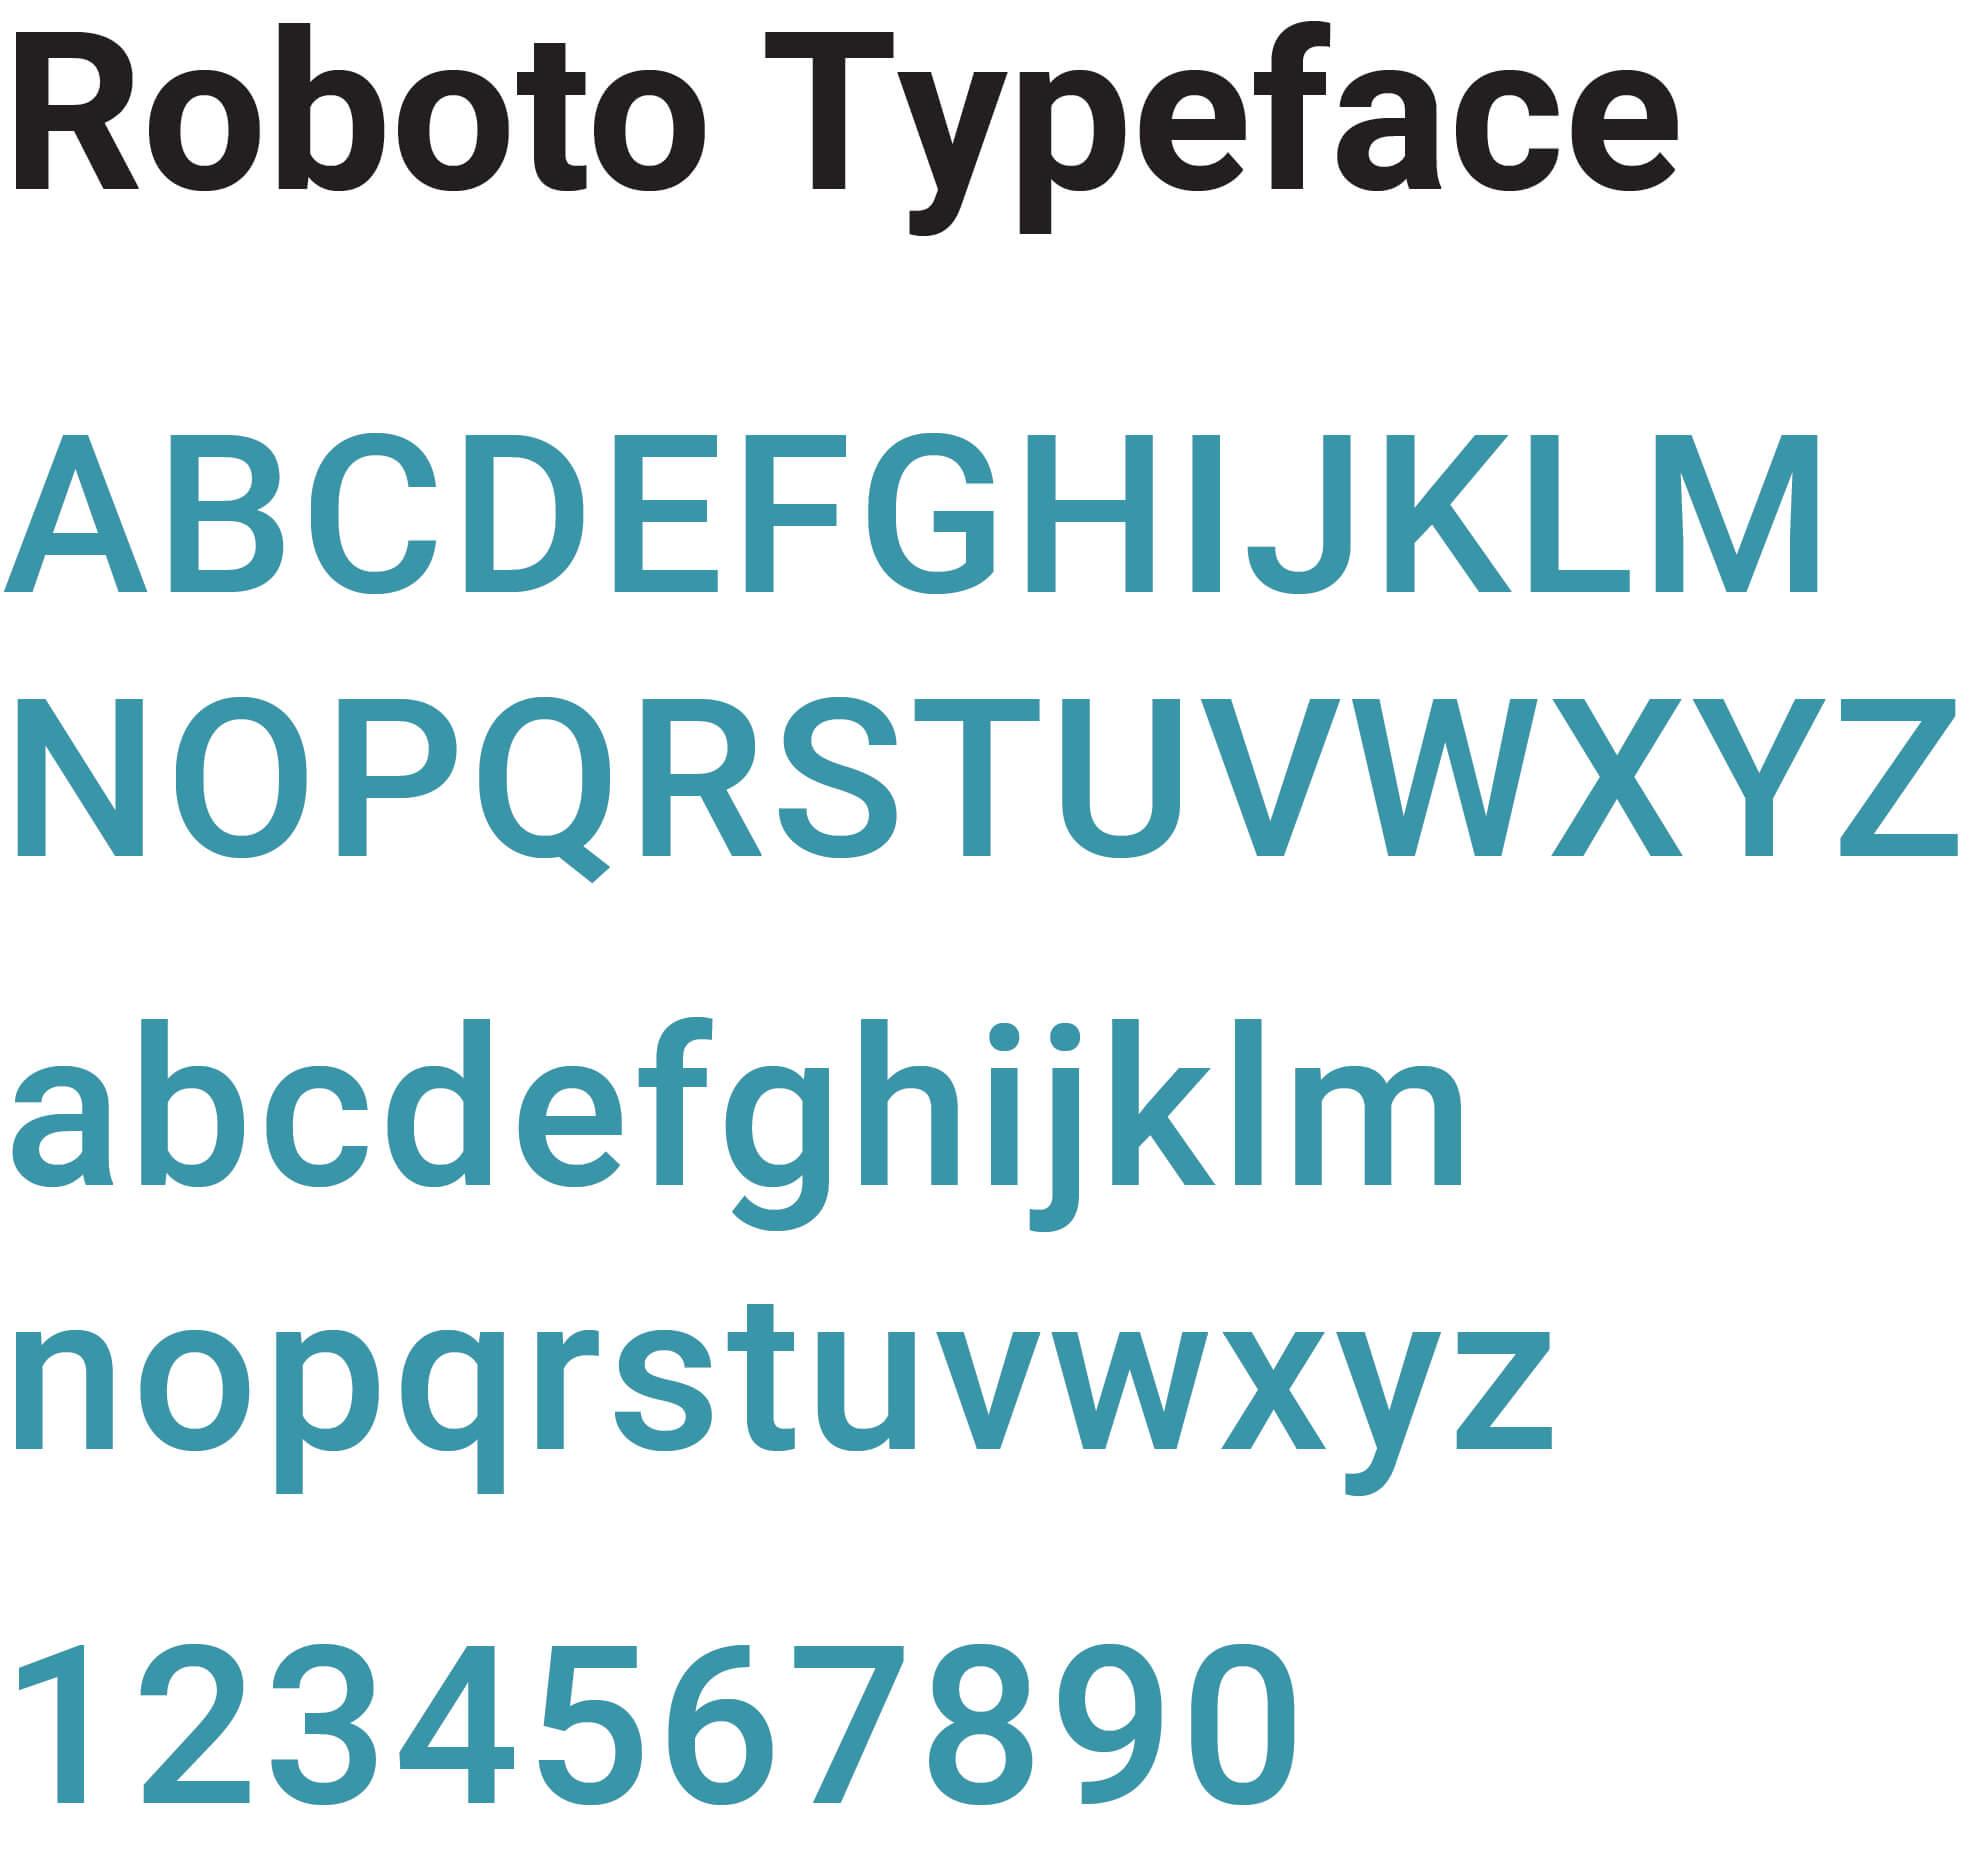 Hum Roboto Typeface | Toby Everett